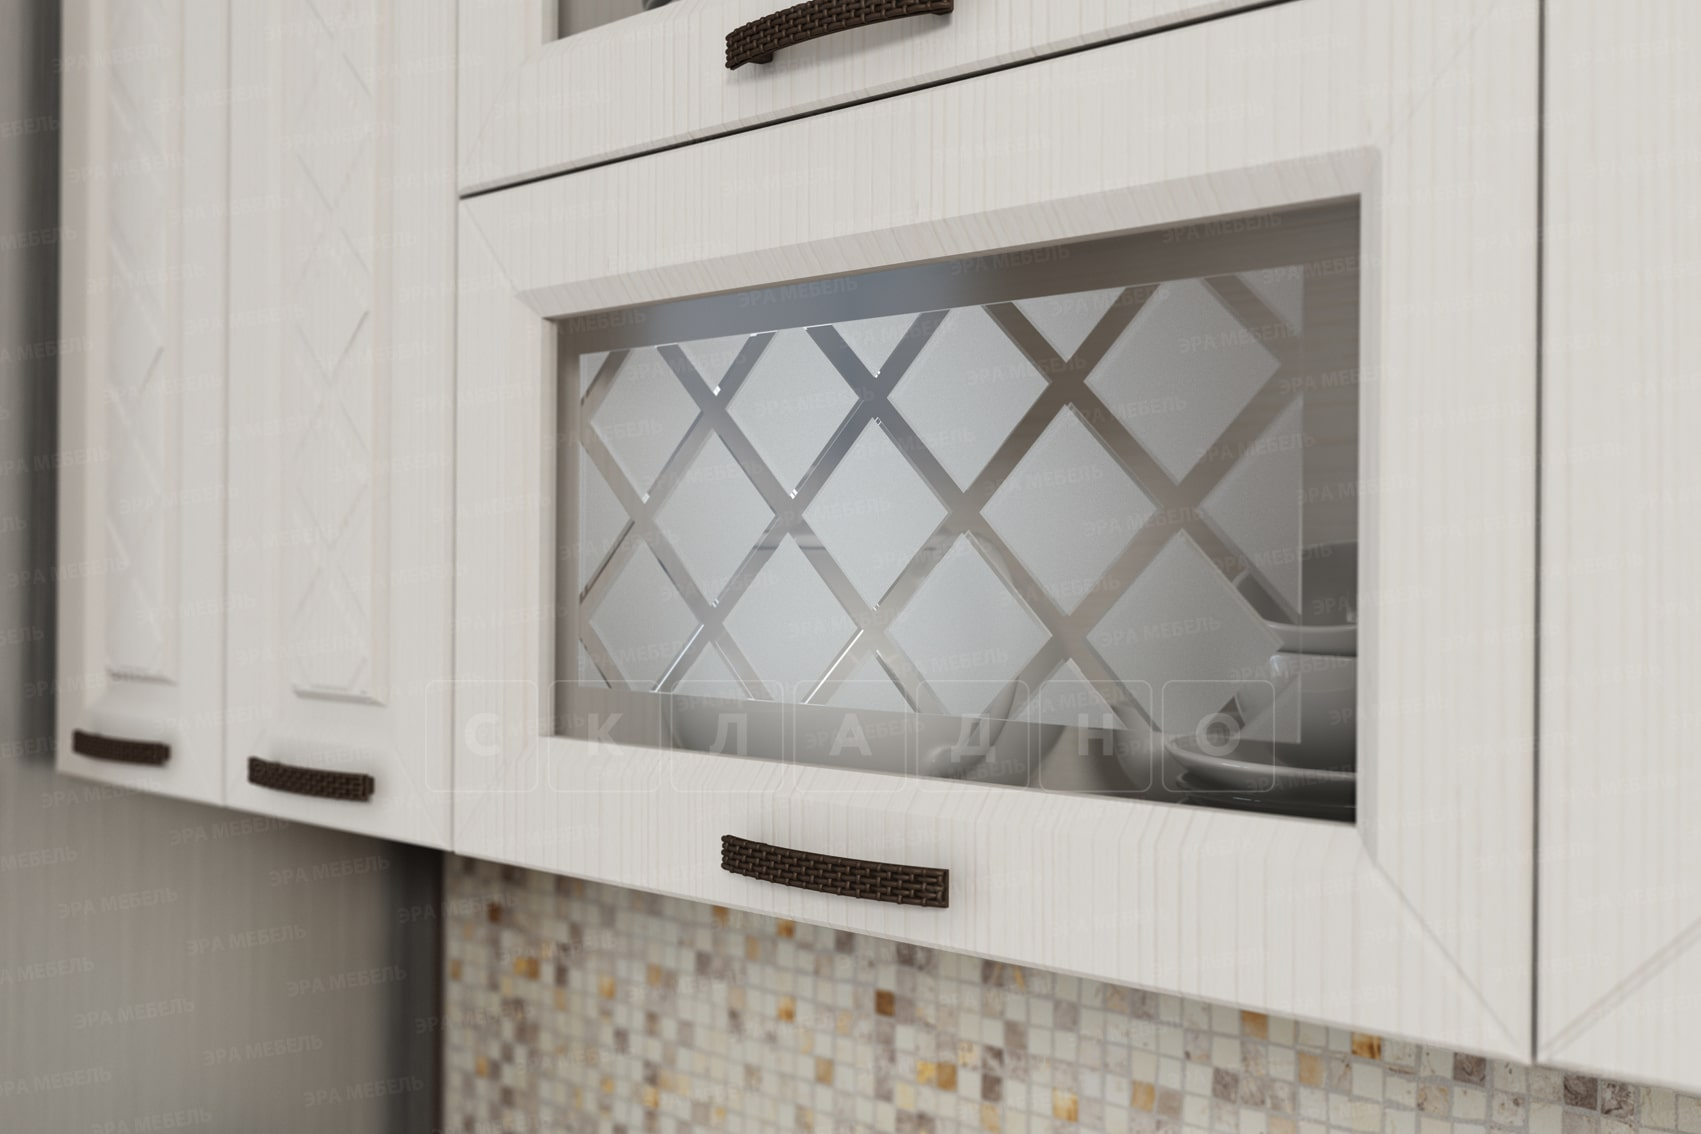 Кухонный гарнитур с пеналом Агава 3,0м вариант 2 фото 4 | интернет-магазин Складно